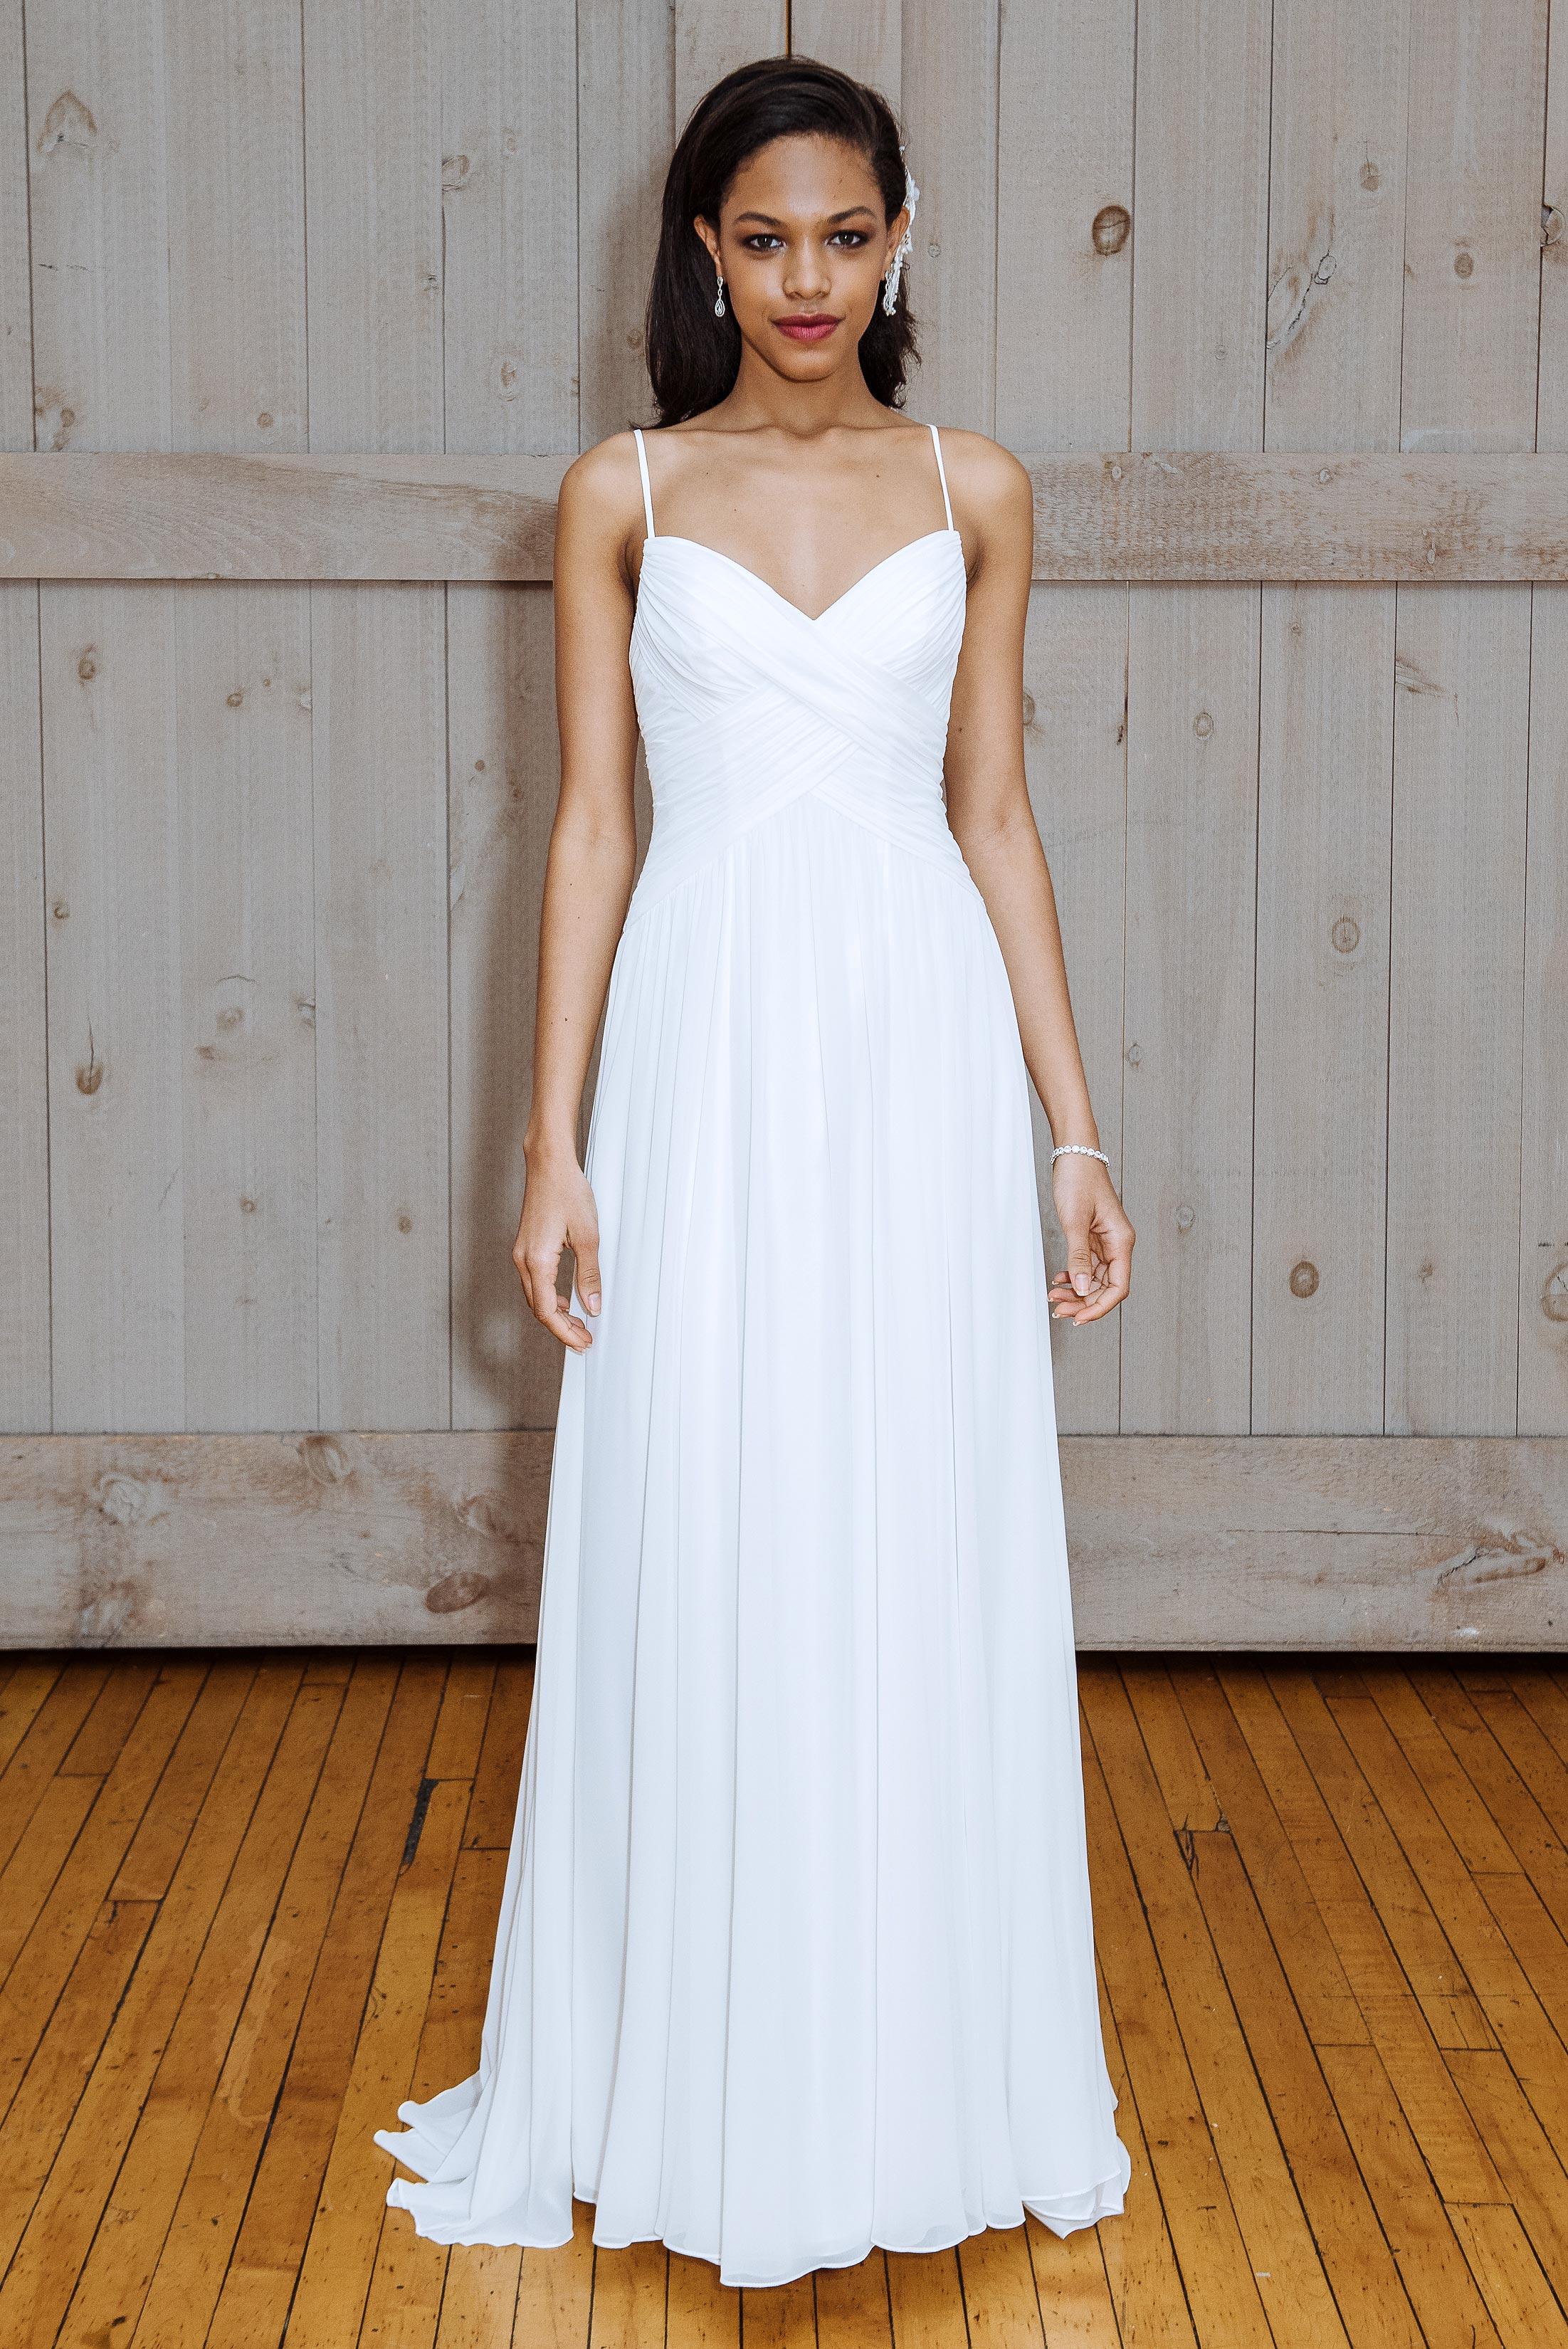 david's bridal spaghetti strap sheath wedding dress spring 2018